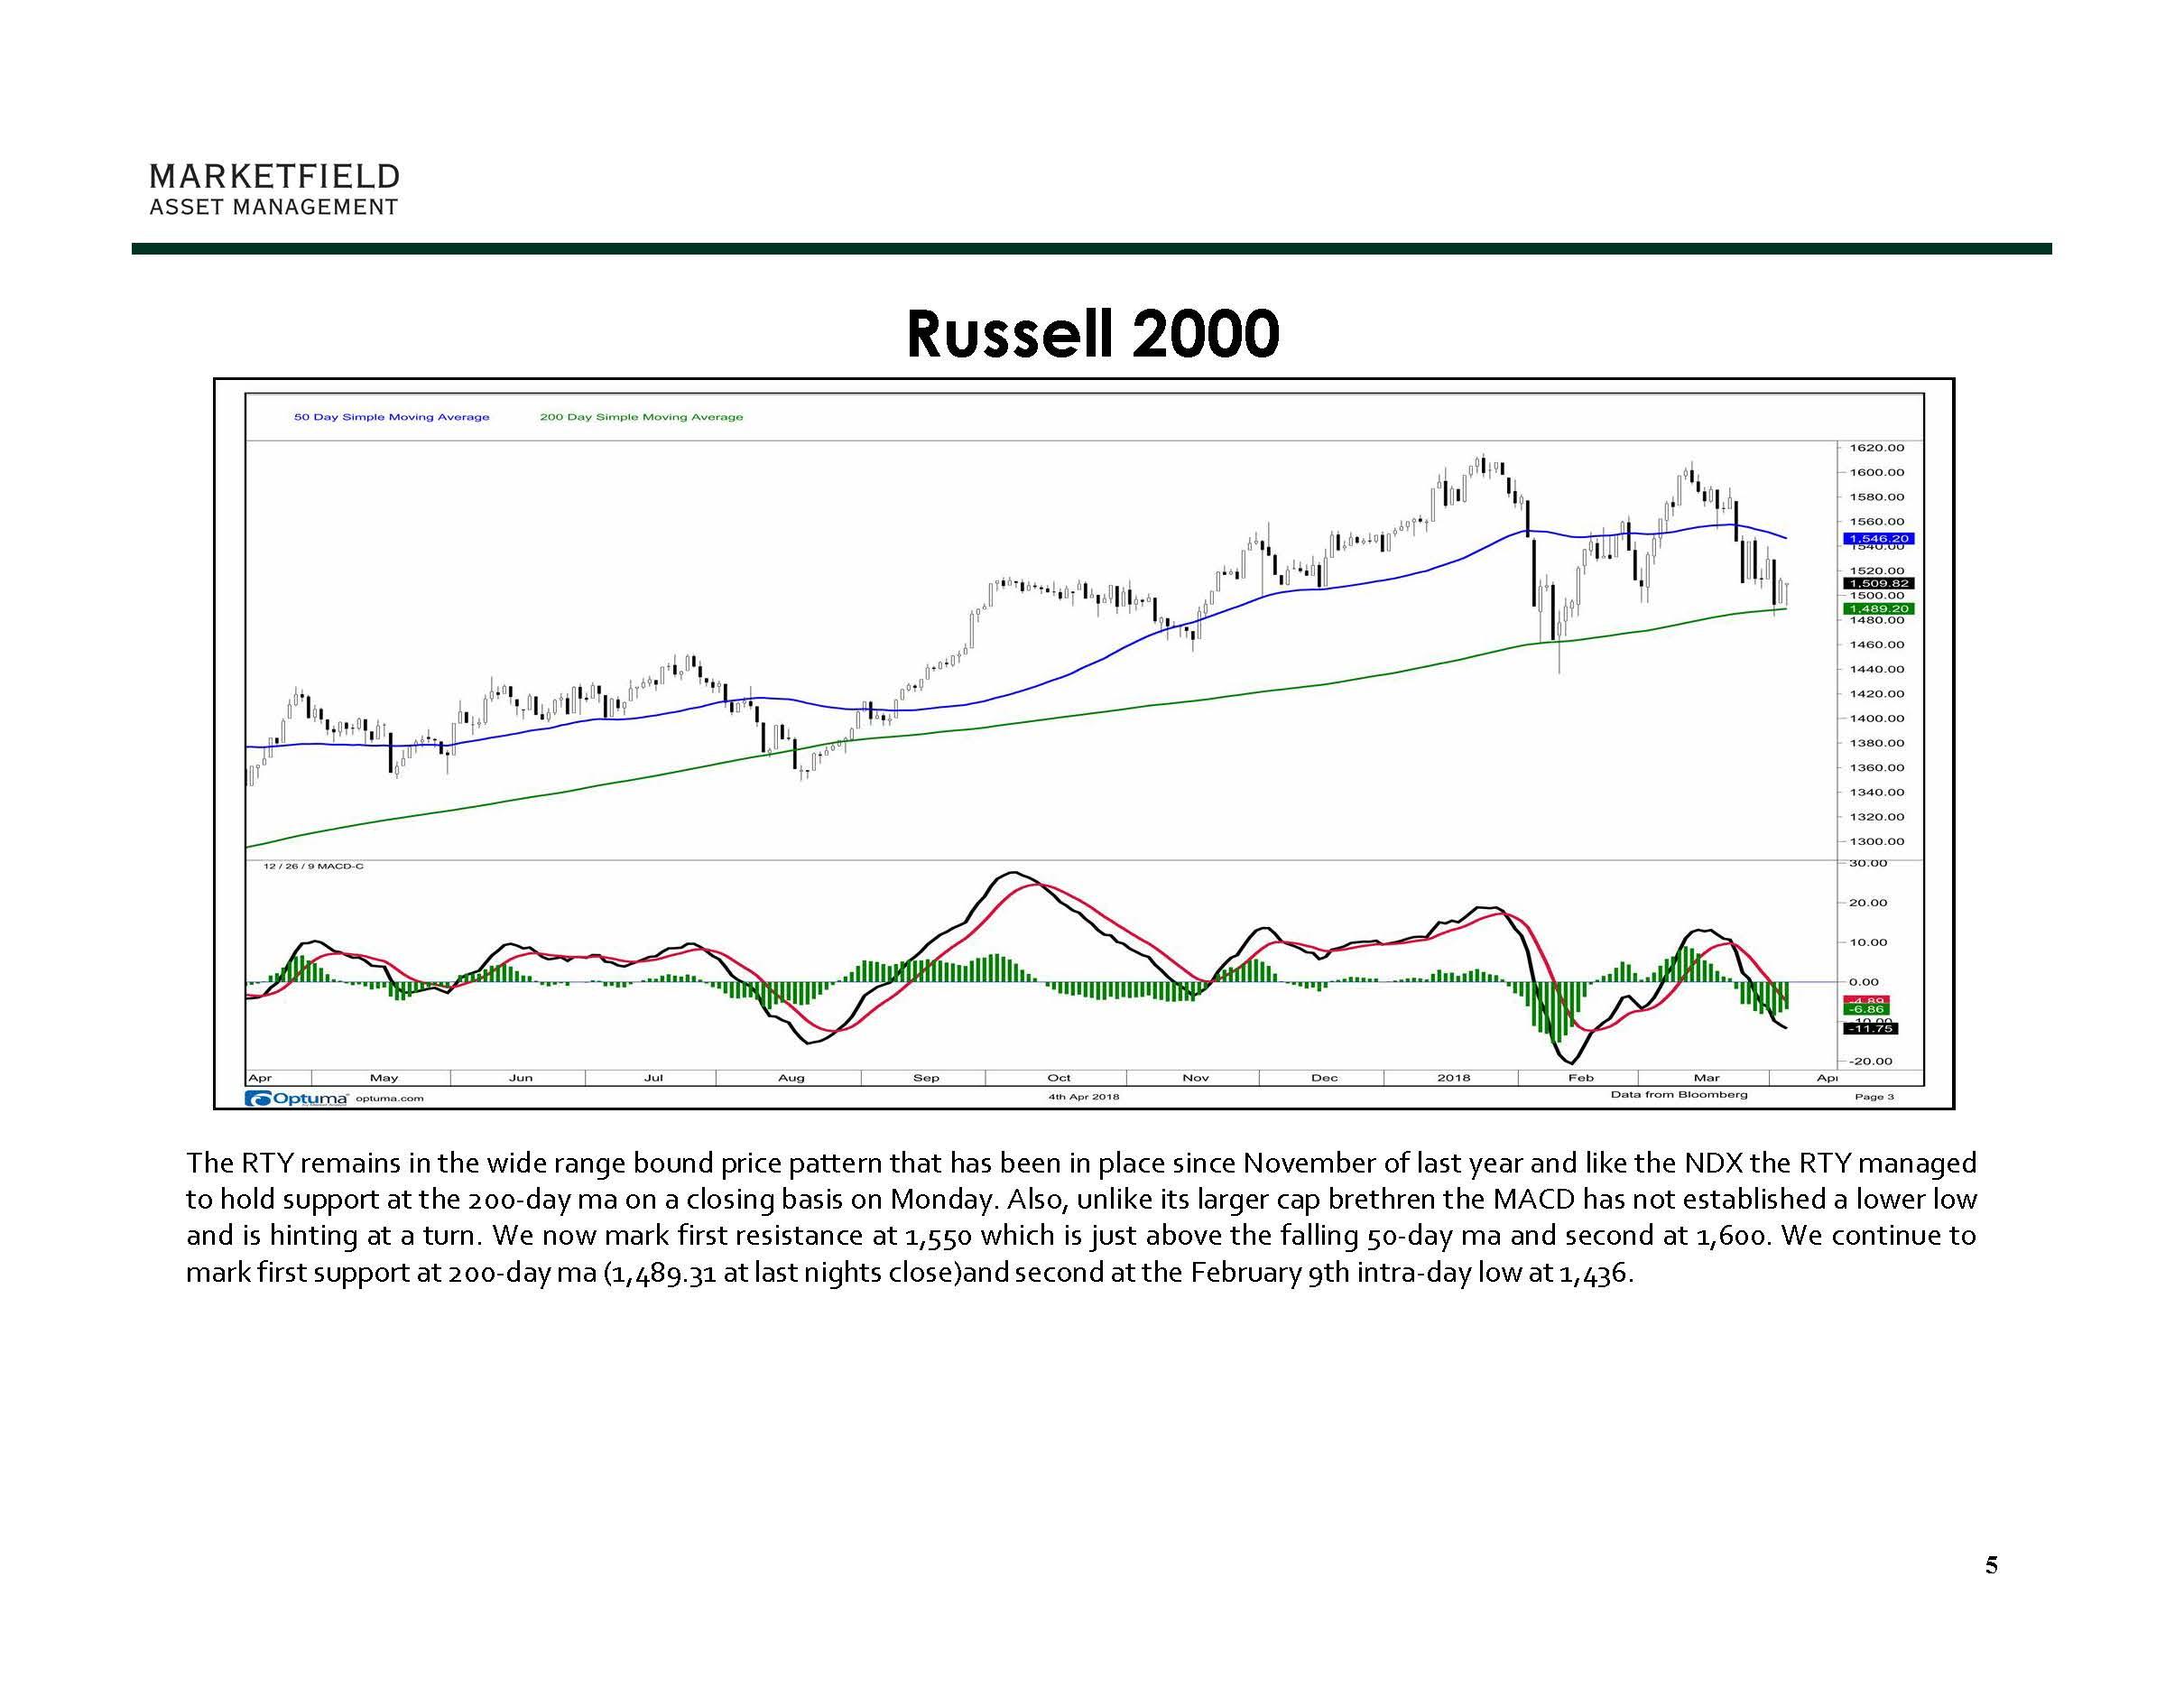 April 5_Marketfield Weekly Speculator_Page_06.jpg